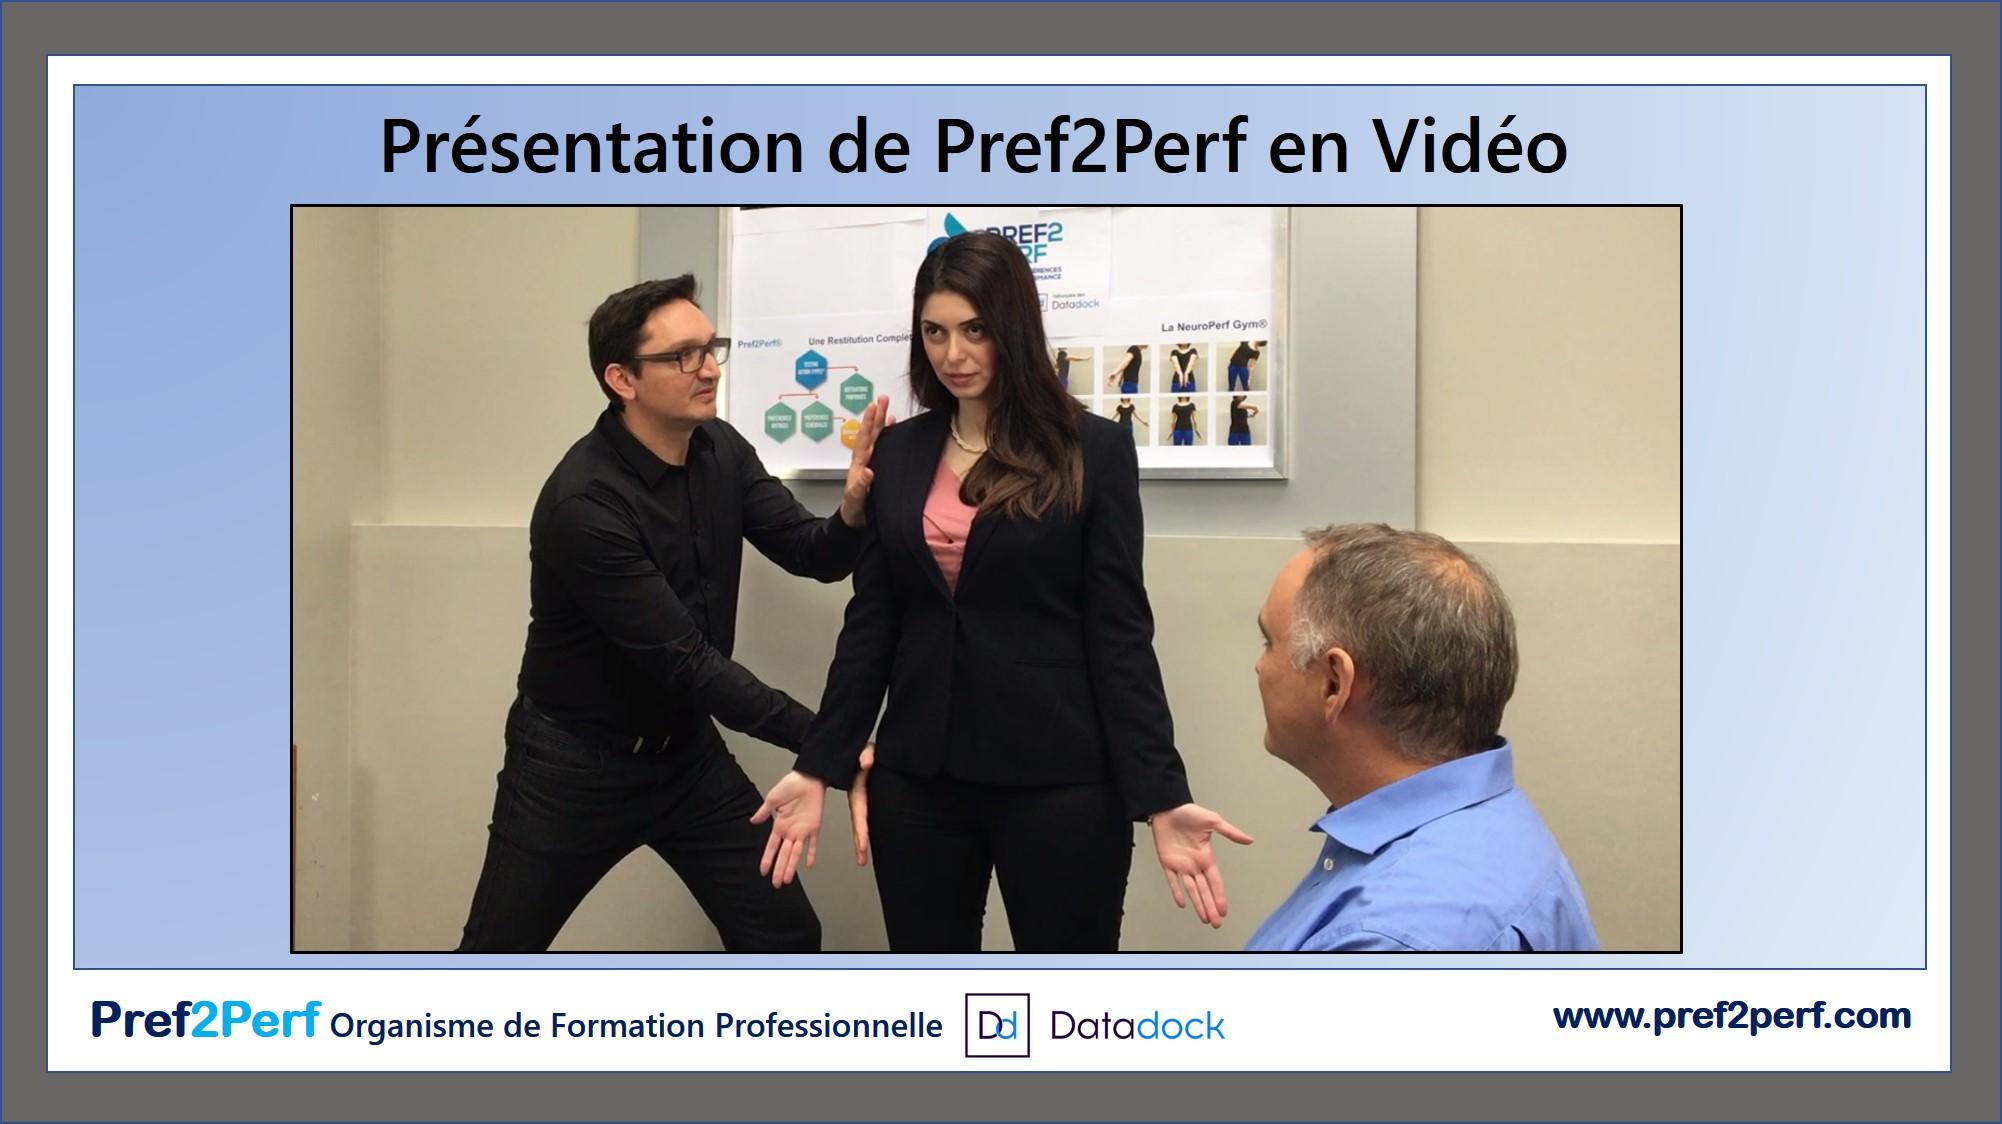 Presentation Pref2Perf